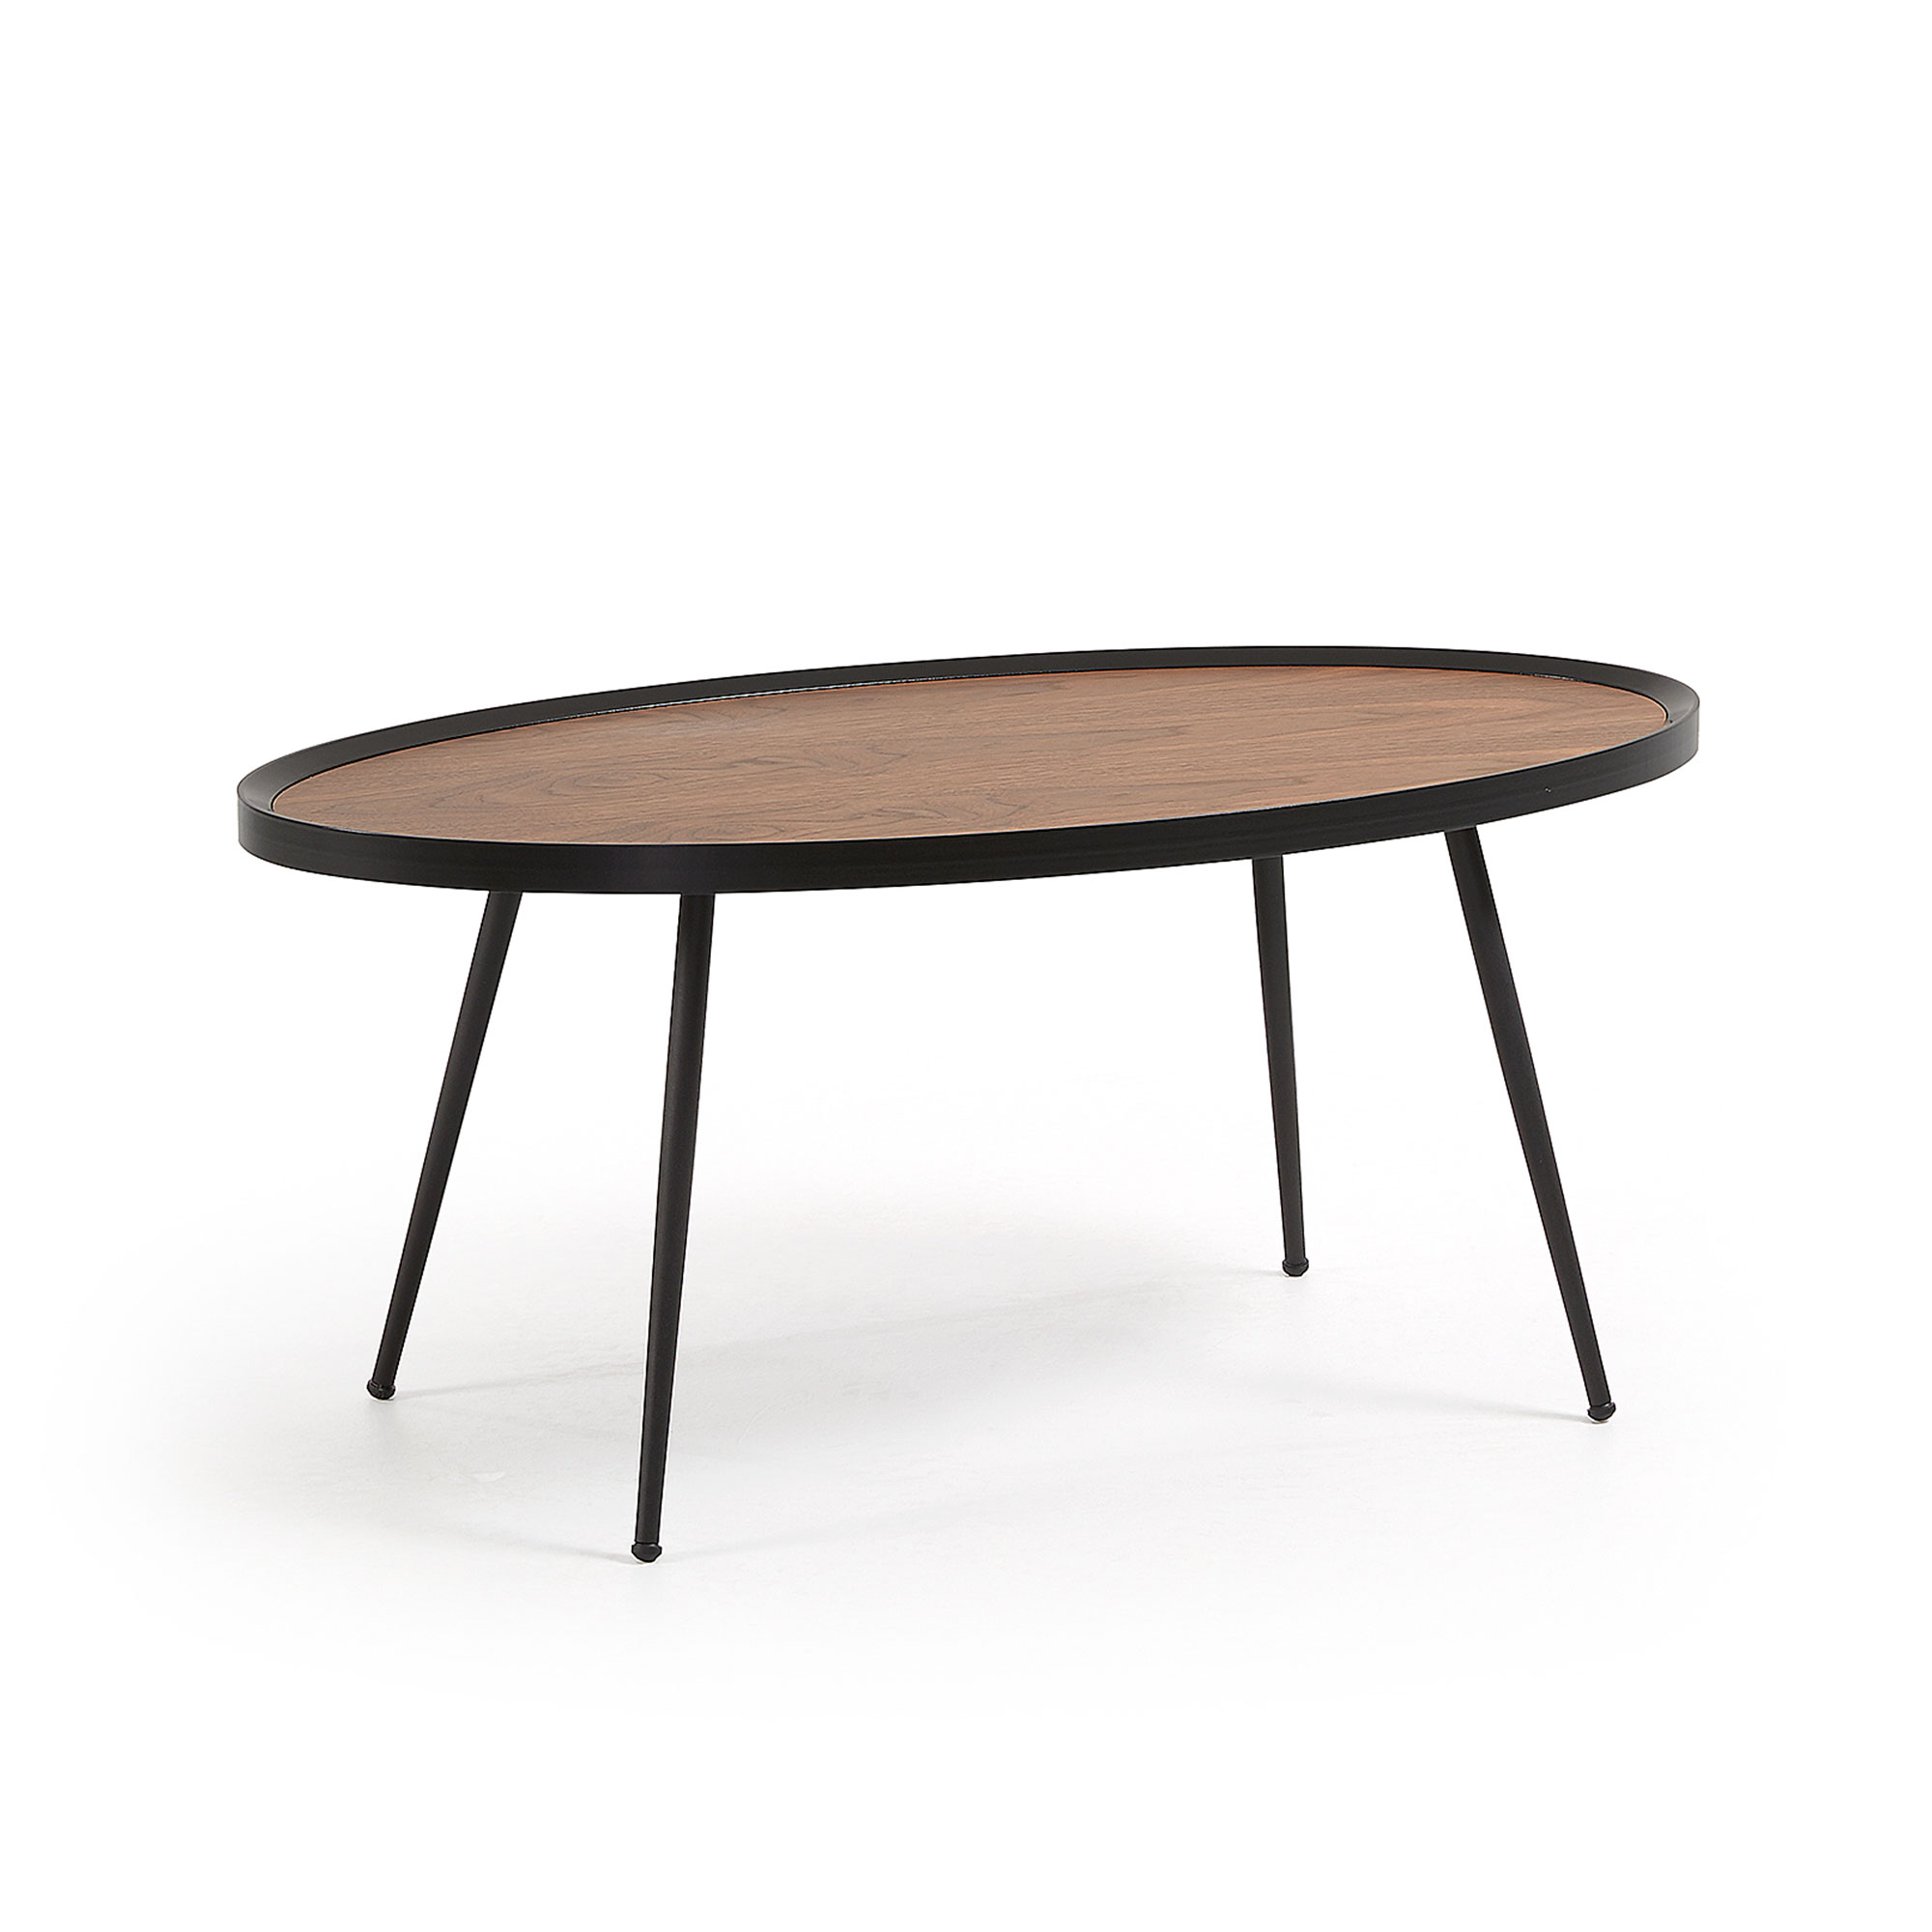 laforma – Laforma kamelia sofabord - brun/sort valnøddefin?r/metal, oval (102x56) fra boboonline.dk